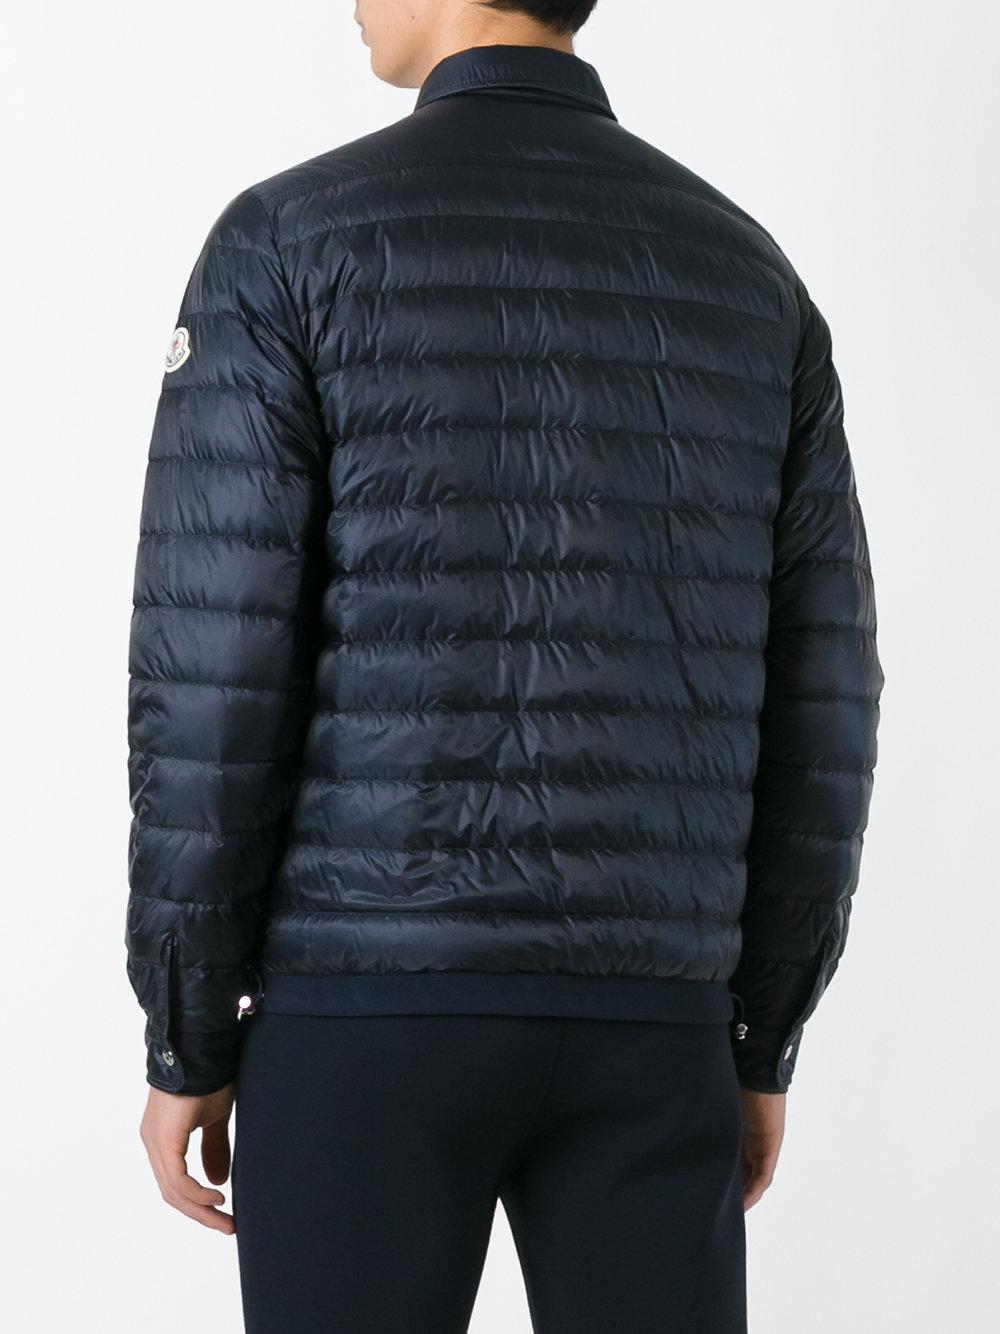 moncler jacket - navy christopher